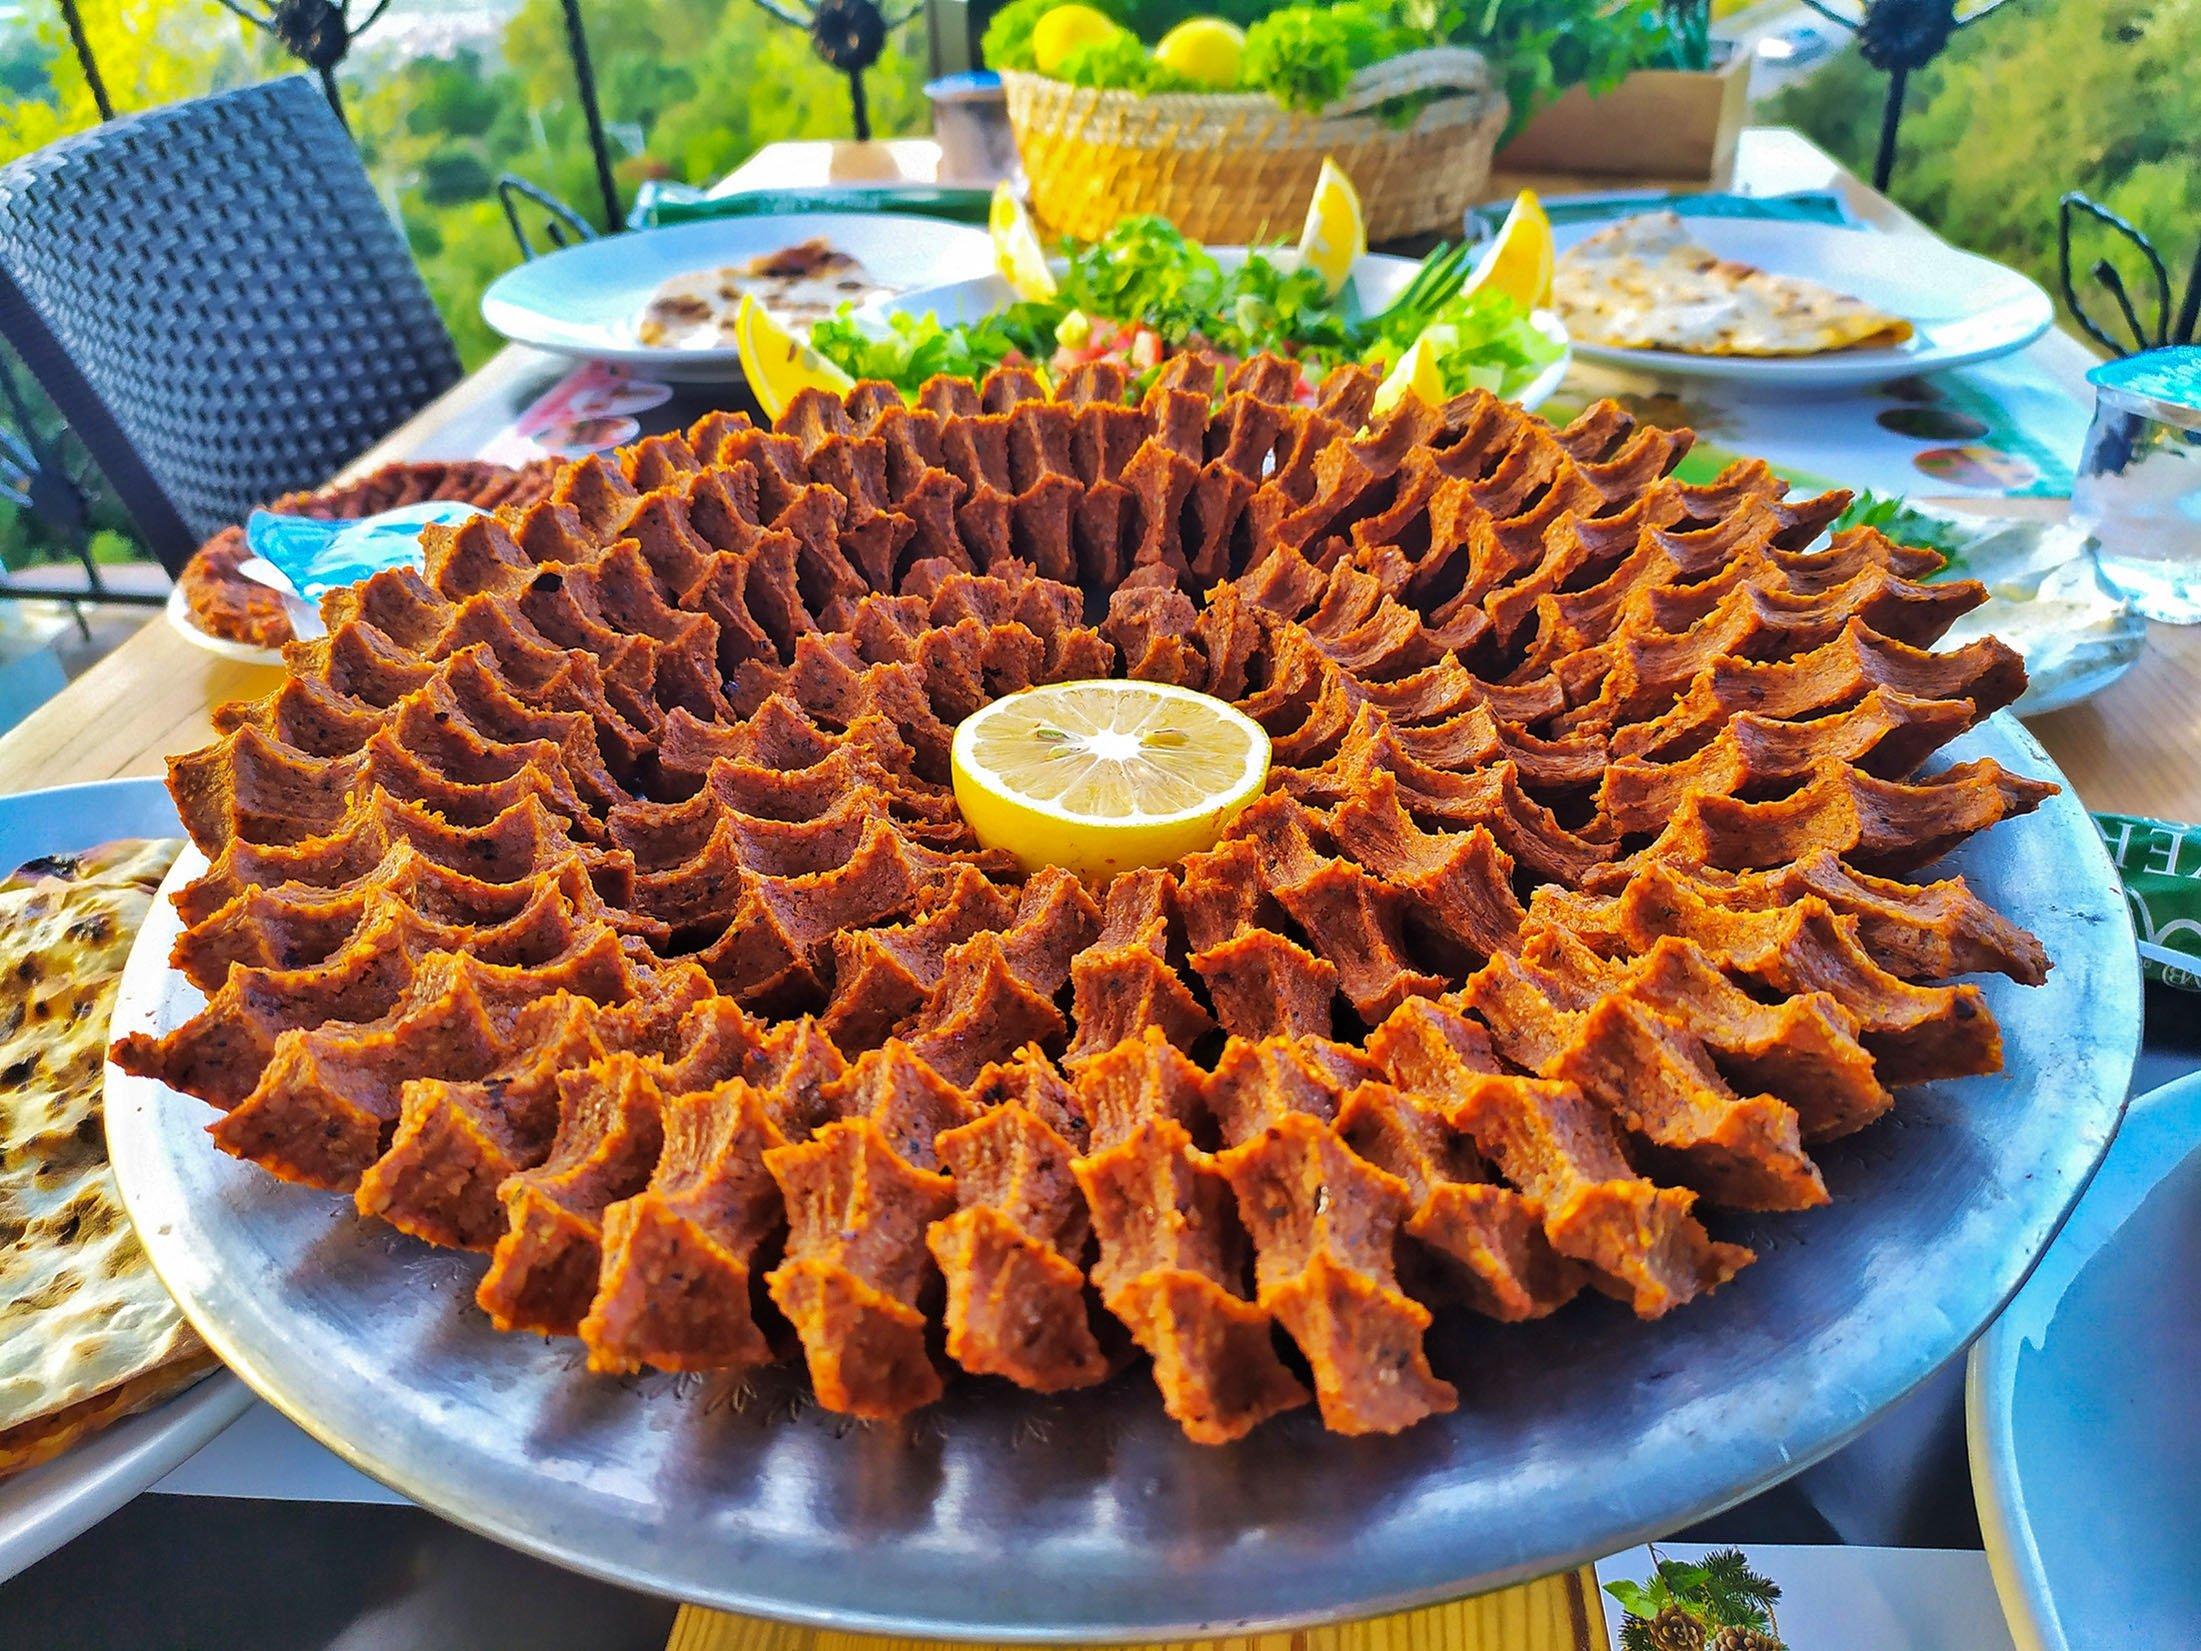 Çiğköfte is a great party food. (Shutterstock Photo)